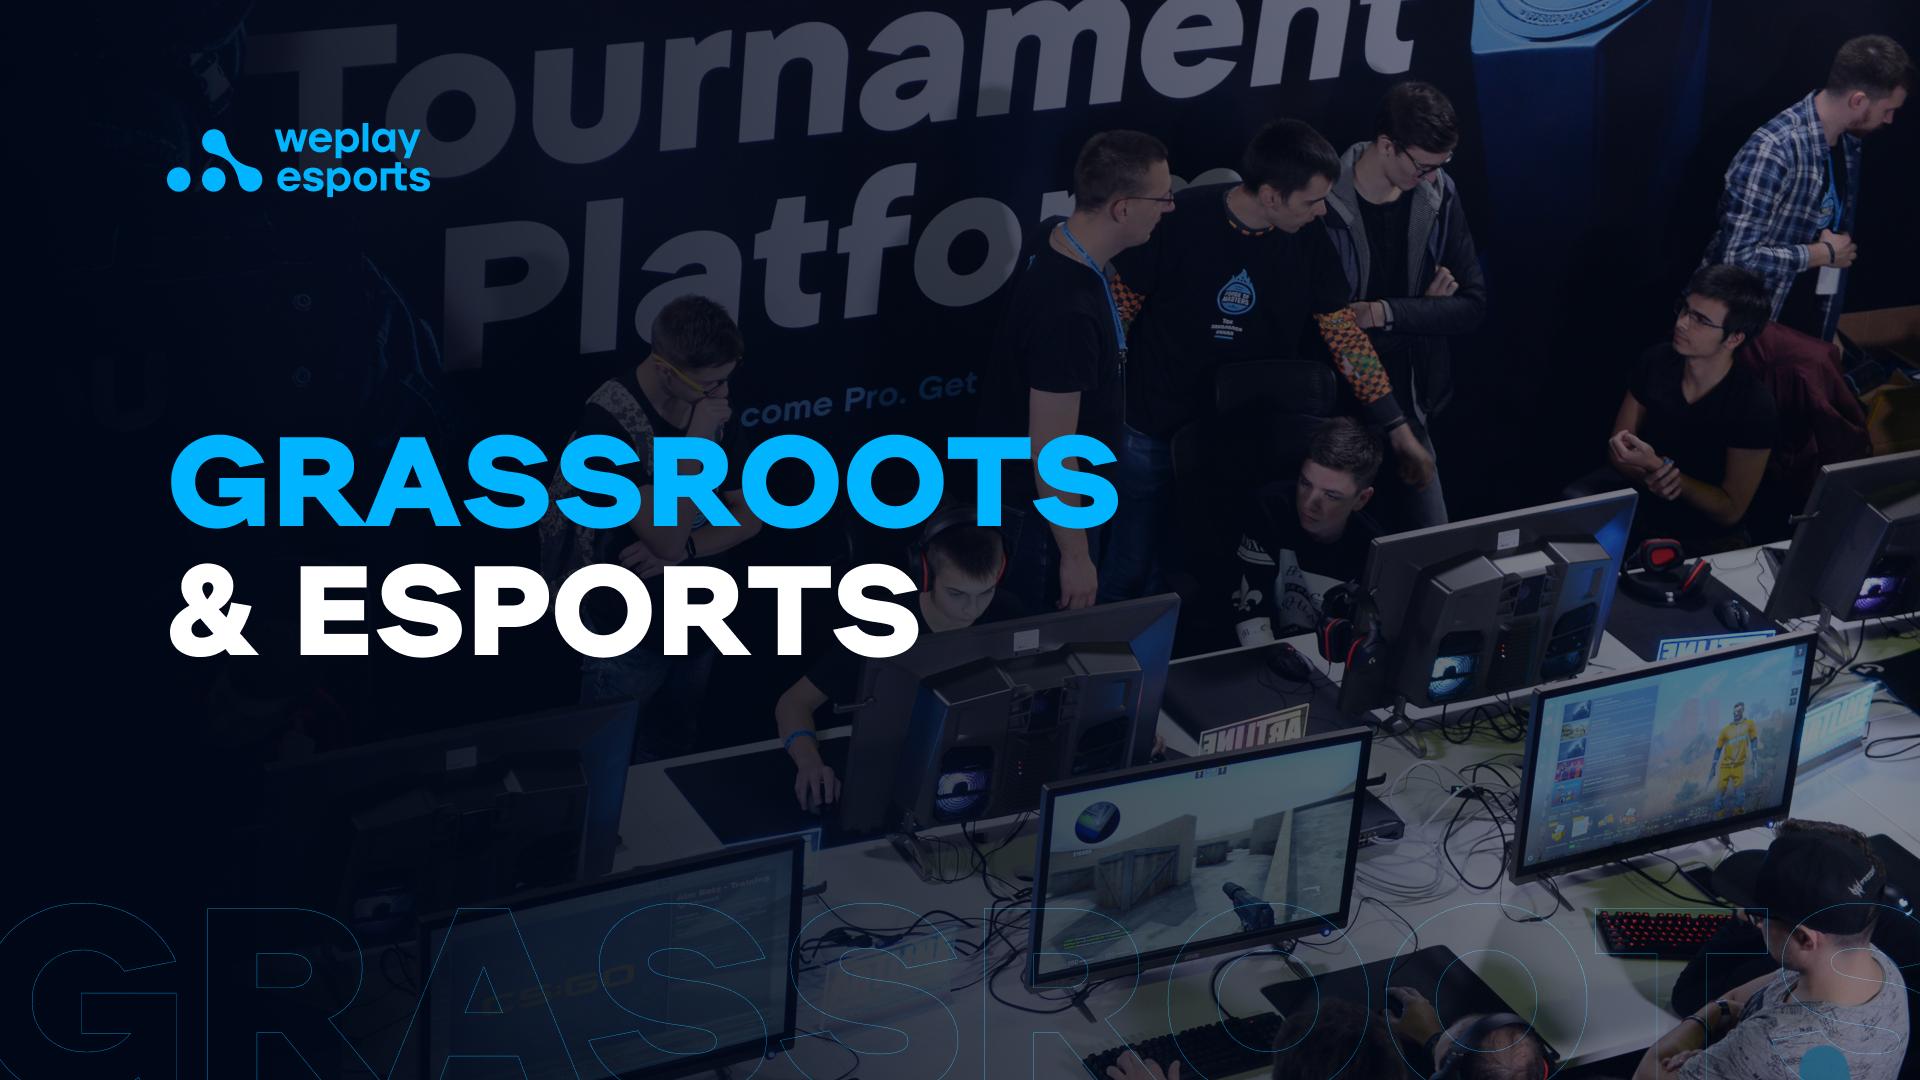 Grassroots & esports